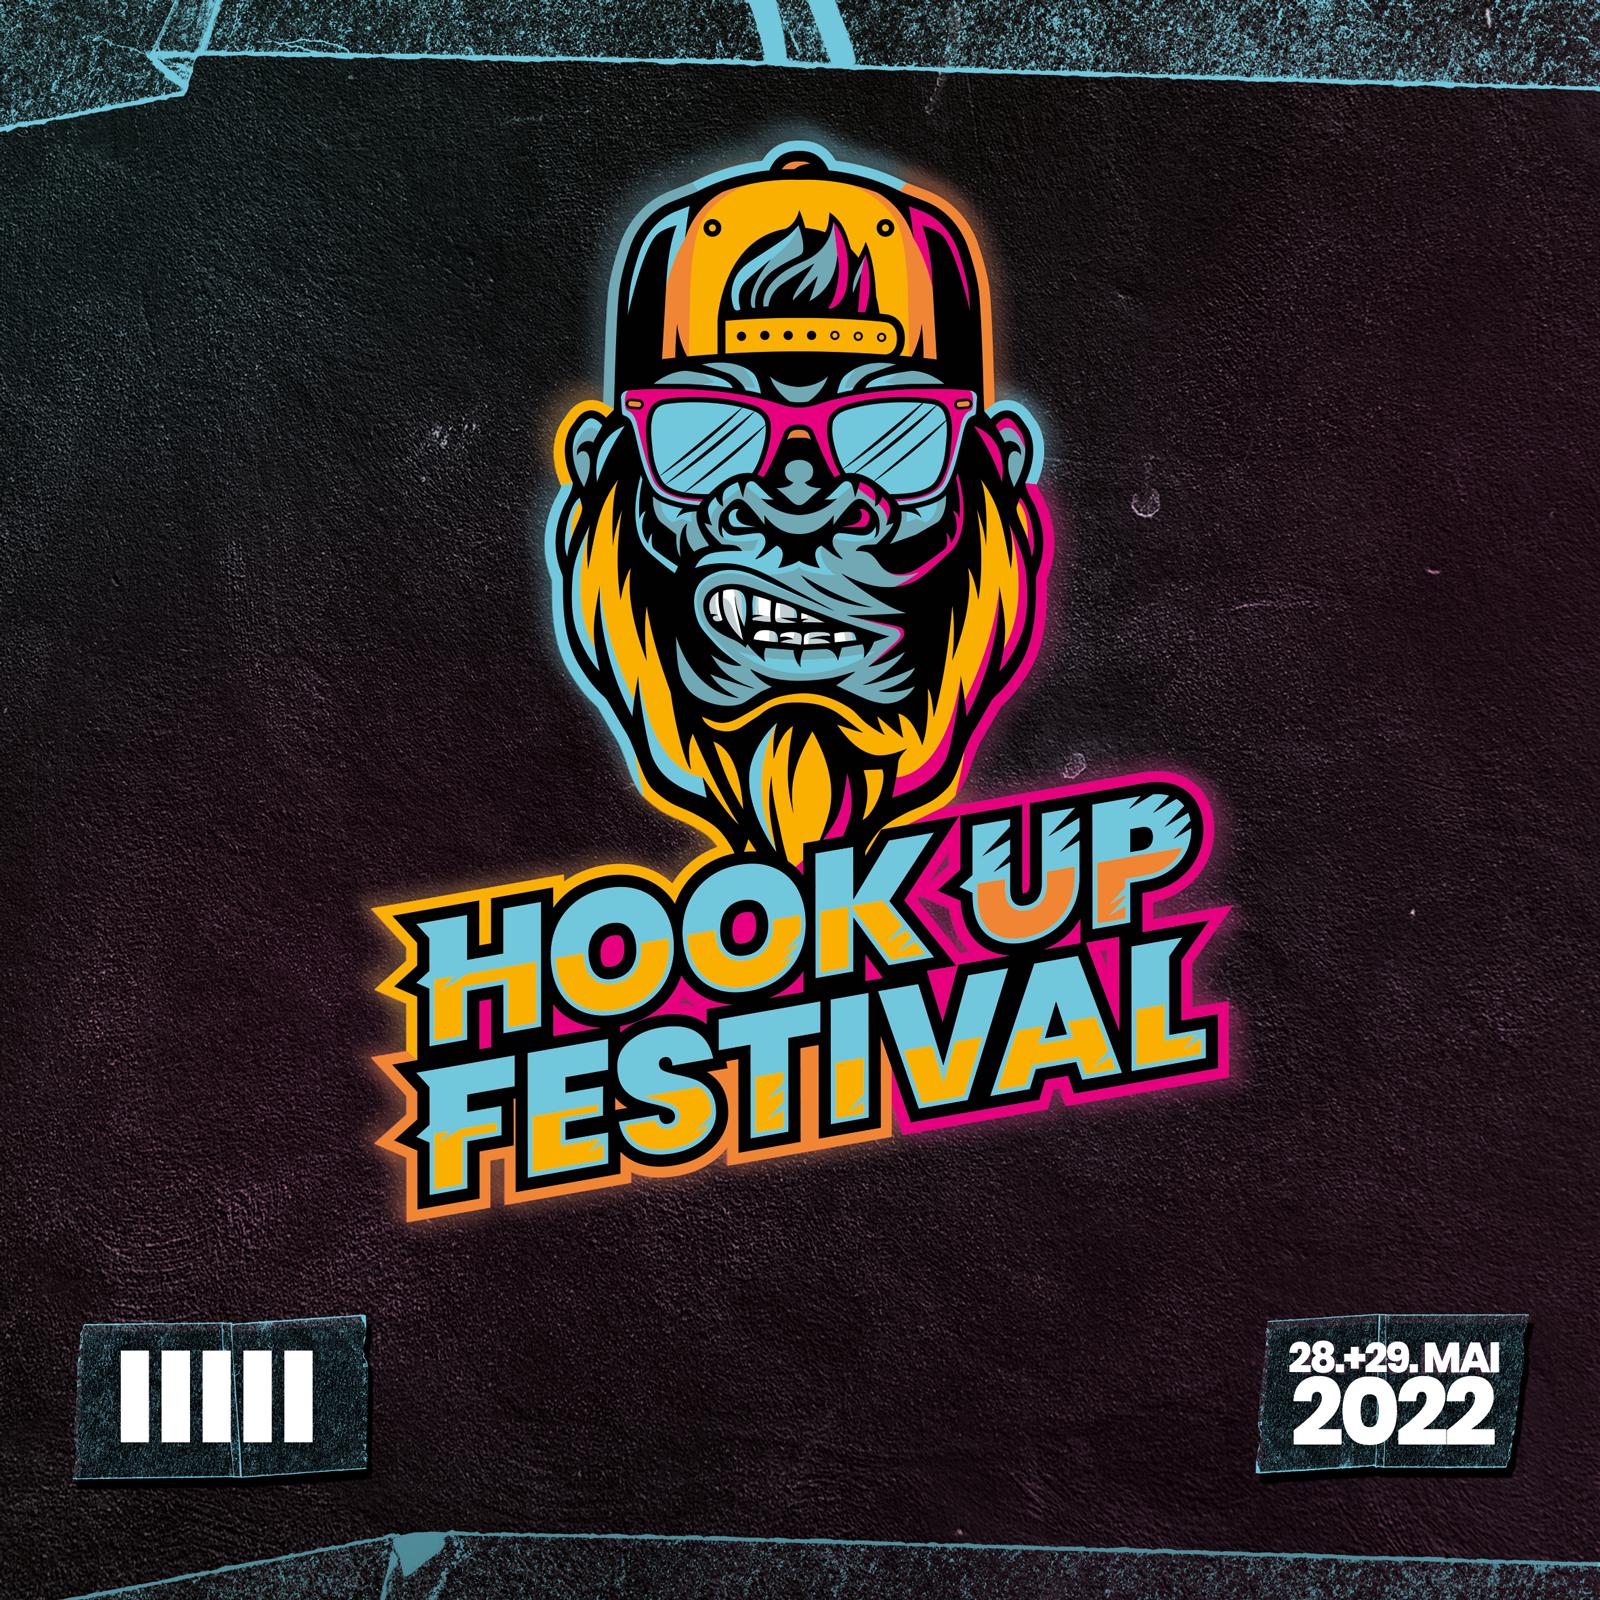 HOOK UP FESTIVAL 2022